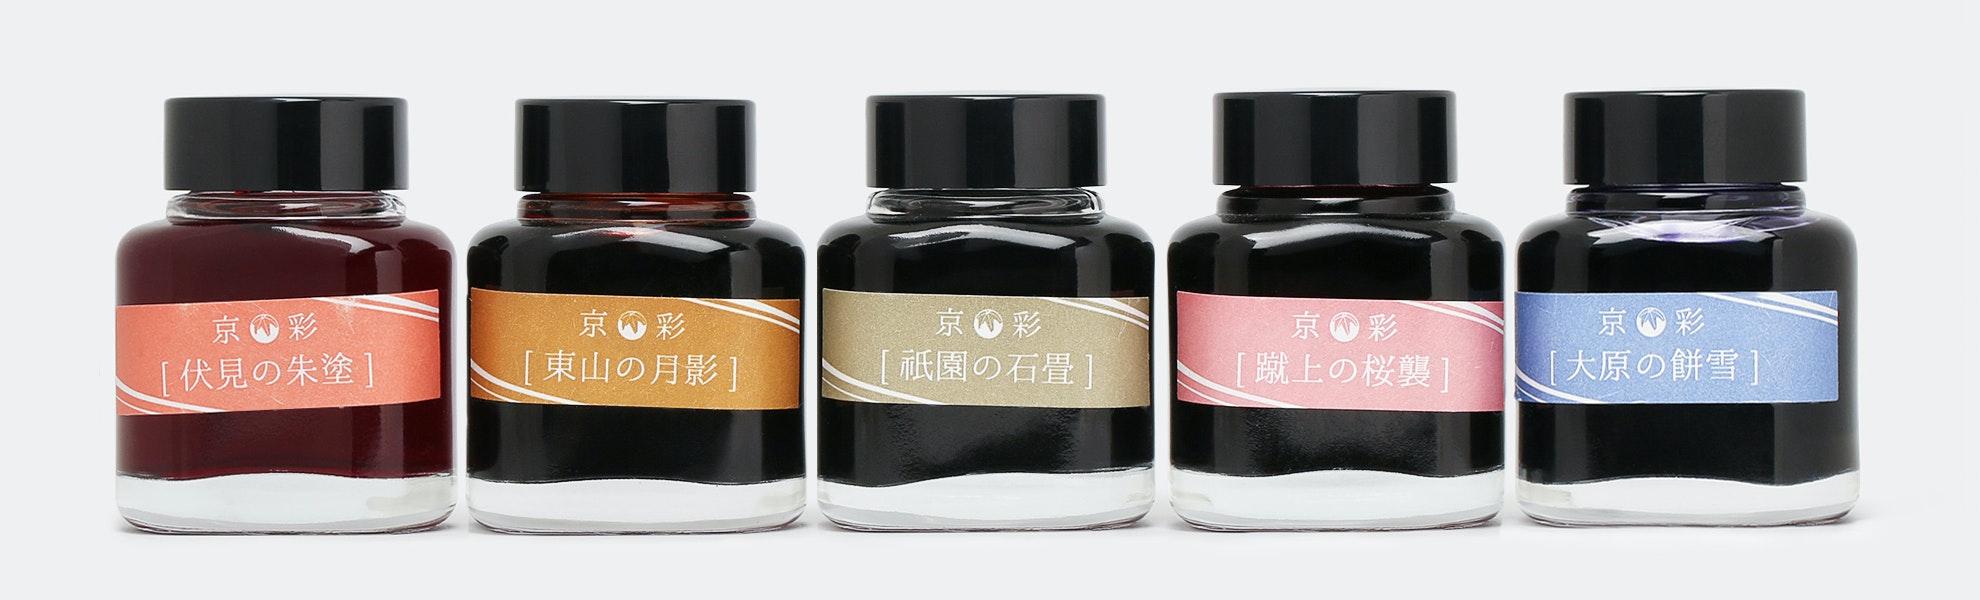 Takeda Jimuki Kyo-Iro Inks (2-Pack)